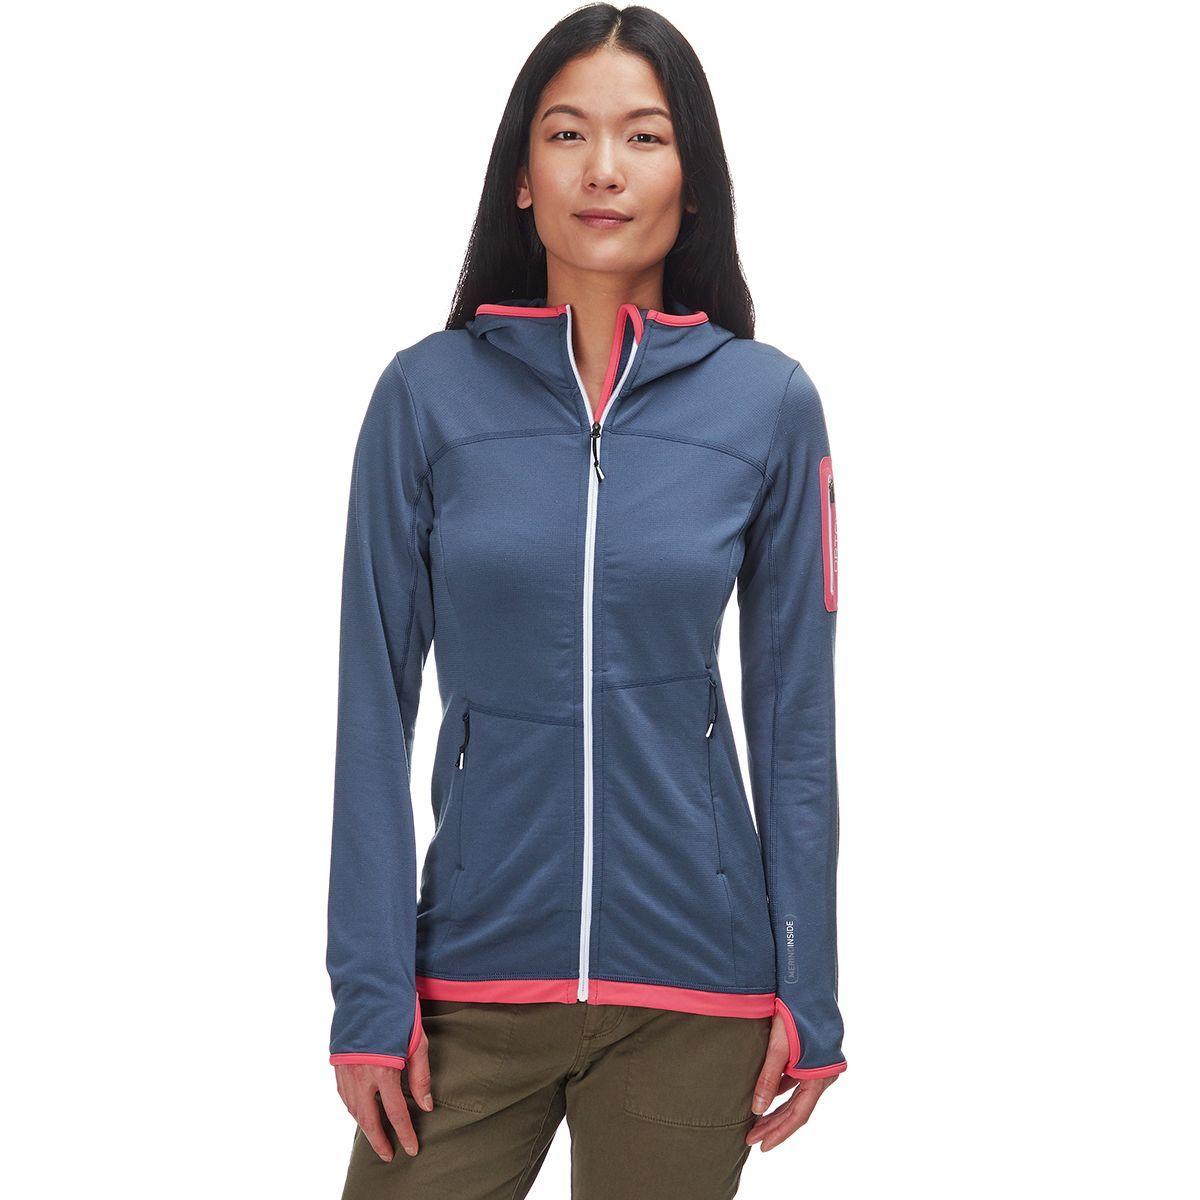 Ortovox Fleece Light Hooded Jacket - Women's